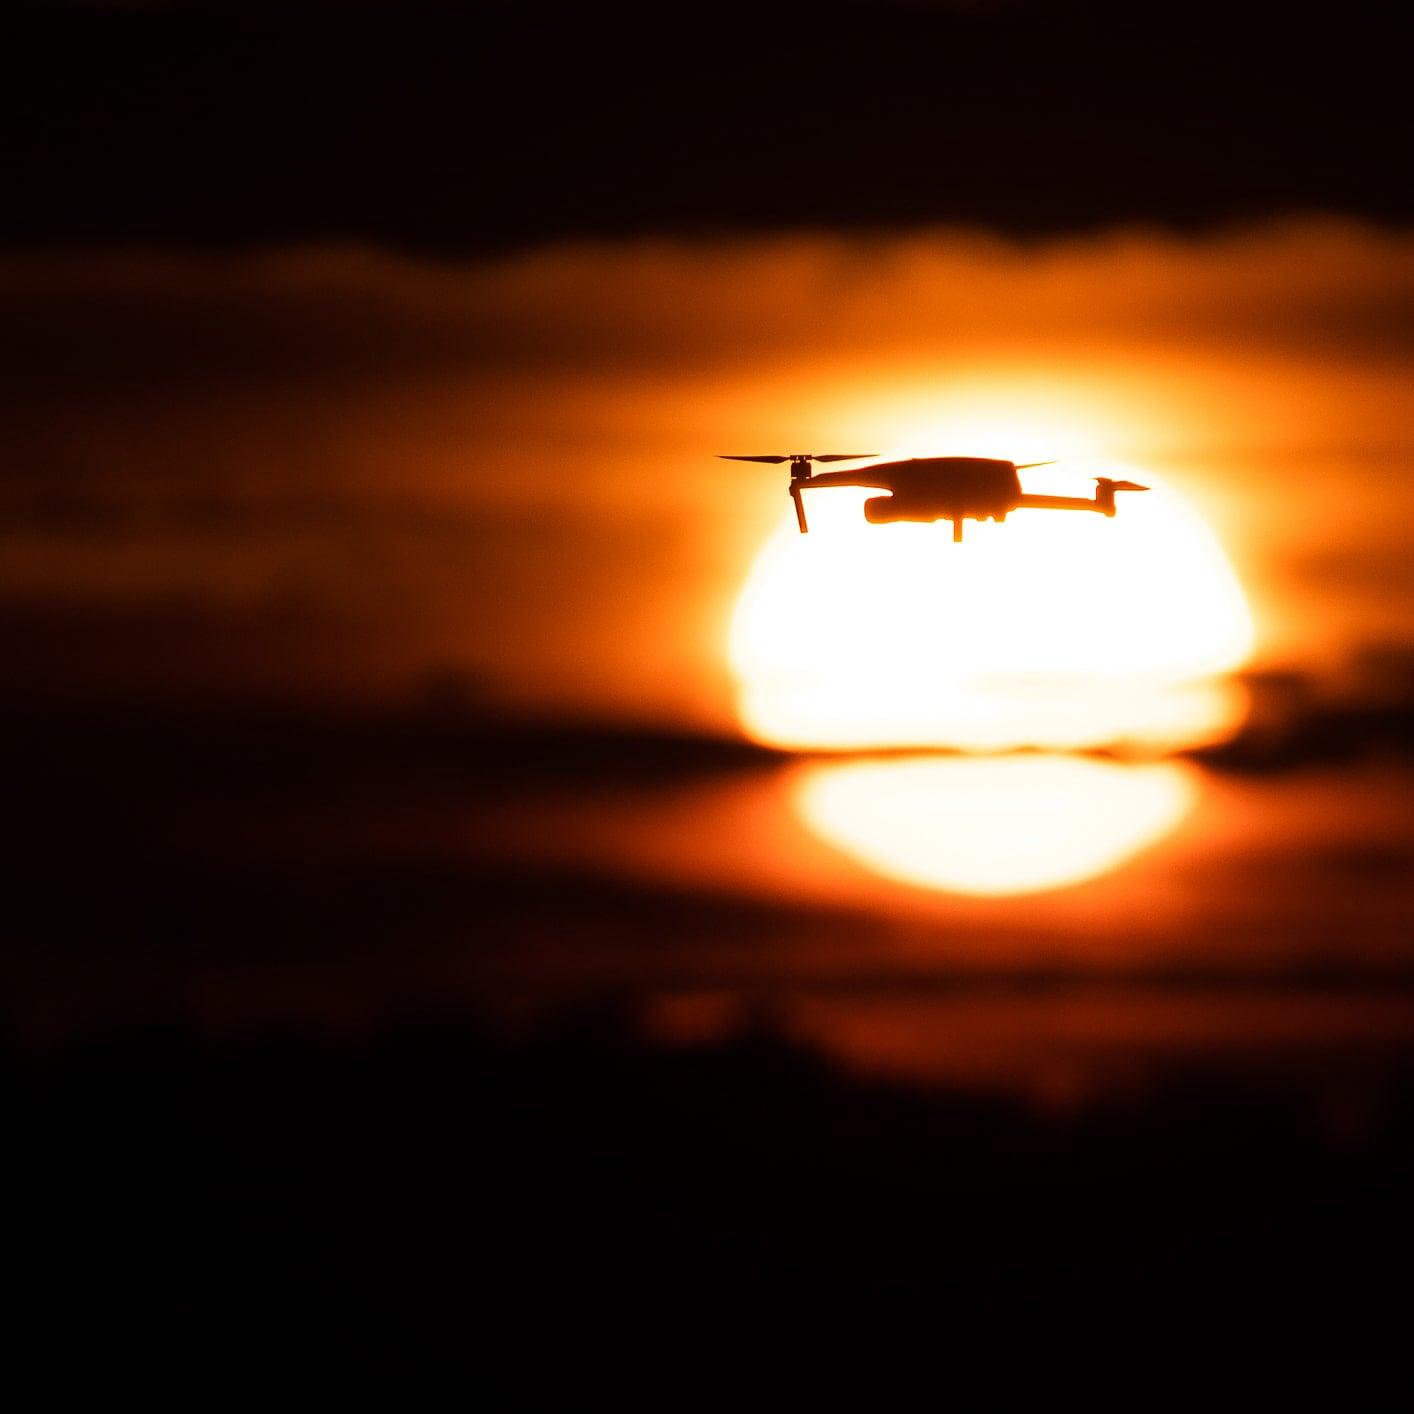 Fotografavimas dronu